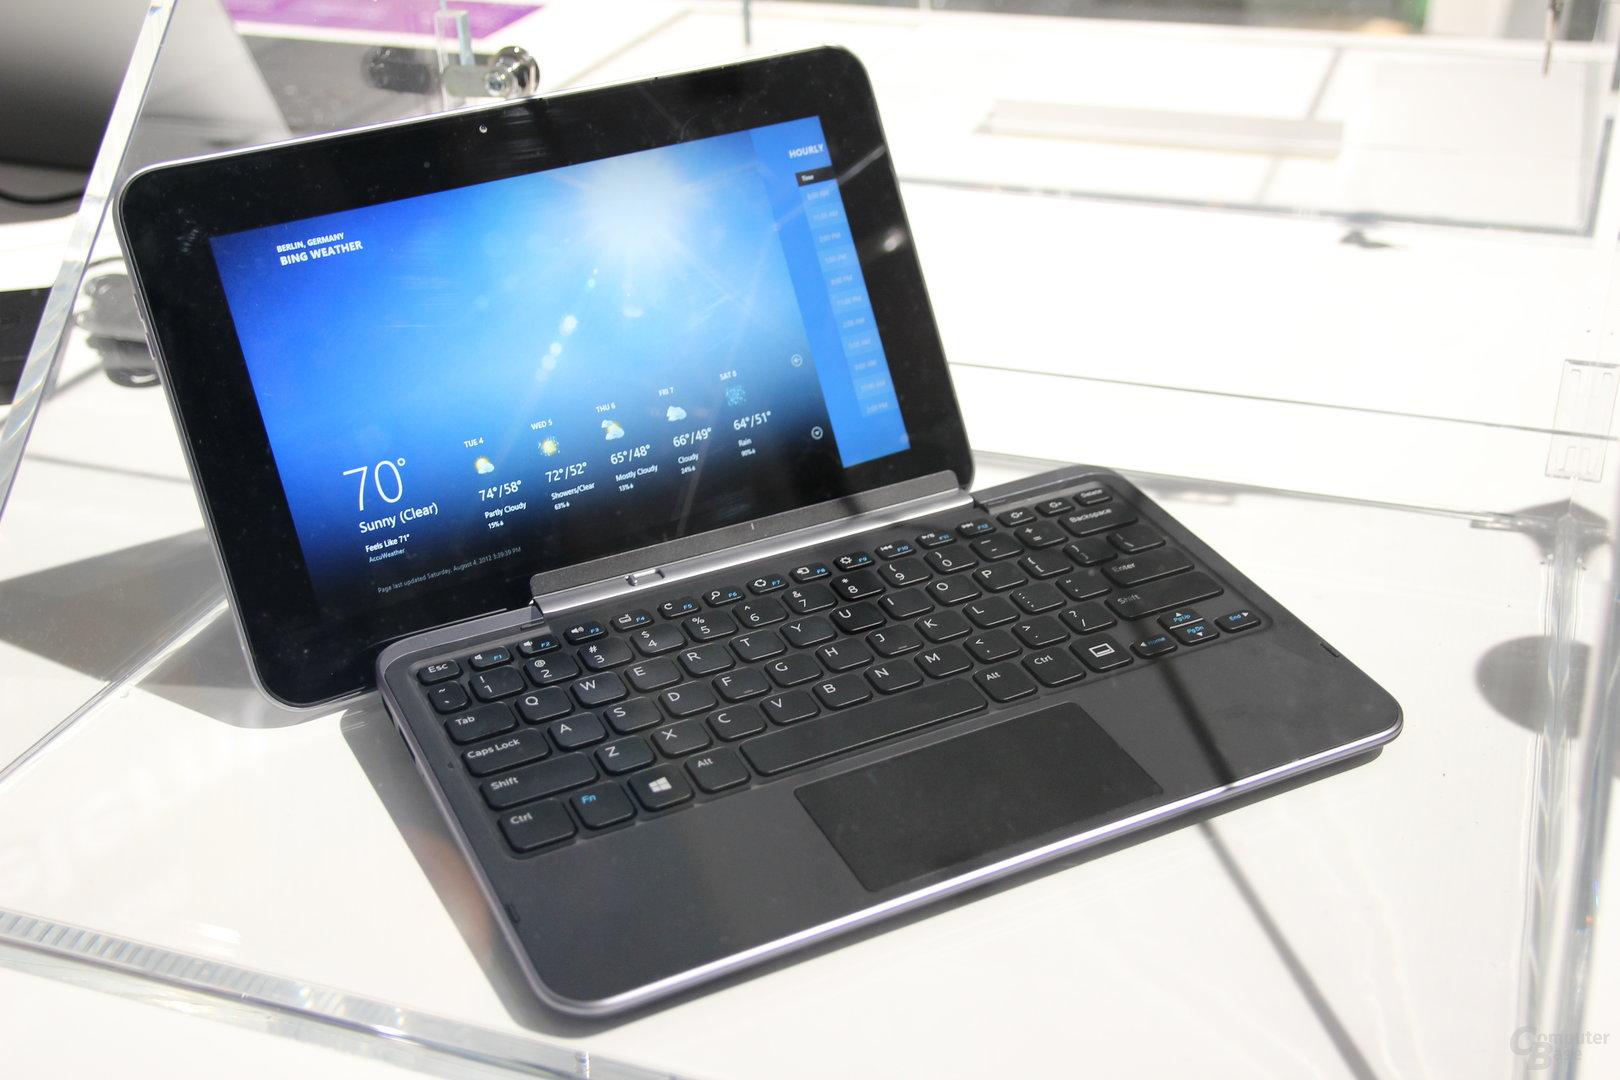 Dell-Präsentation zur IFA 2012